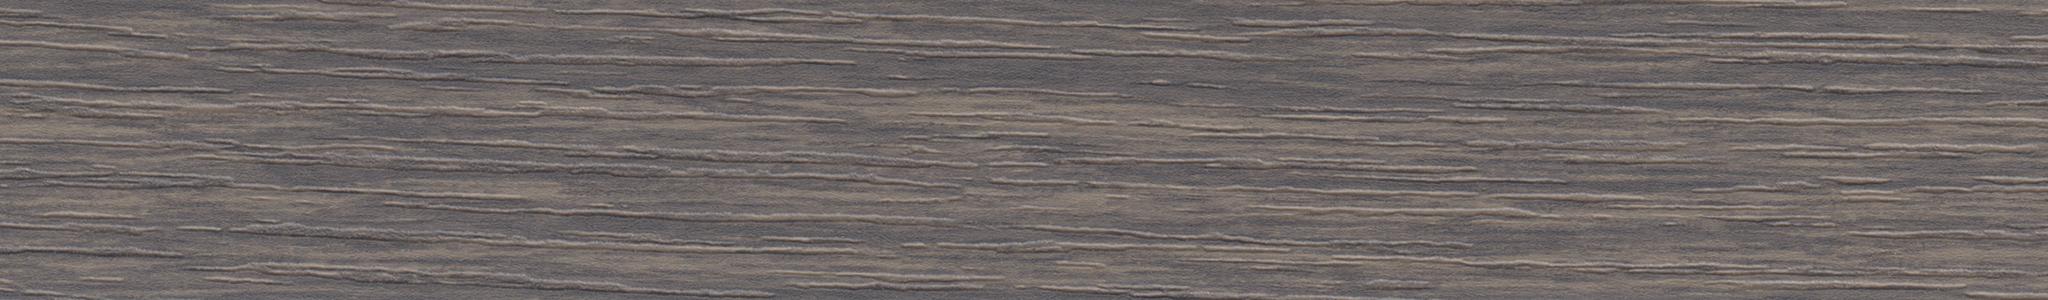 HD 283800 ABS Edge Chestnut Pore Softmatt